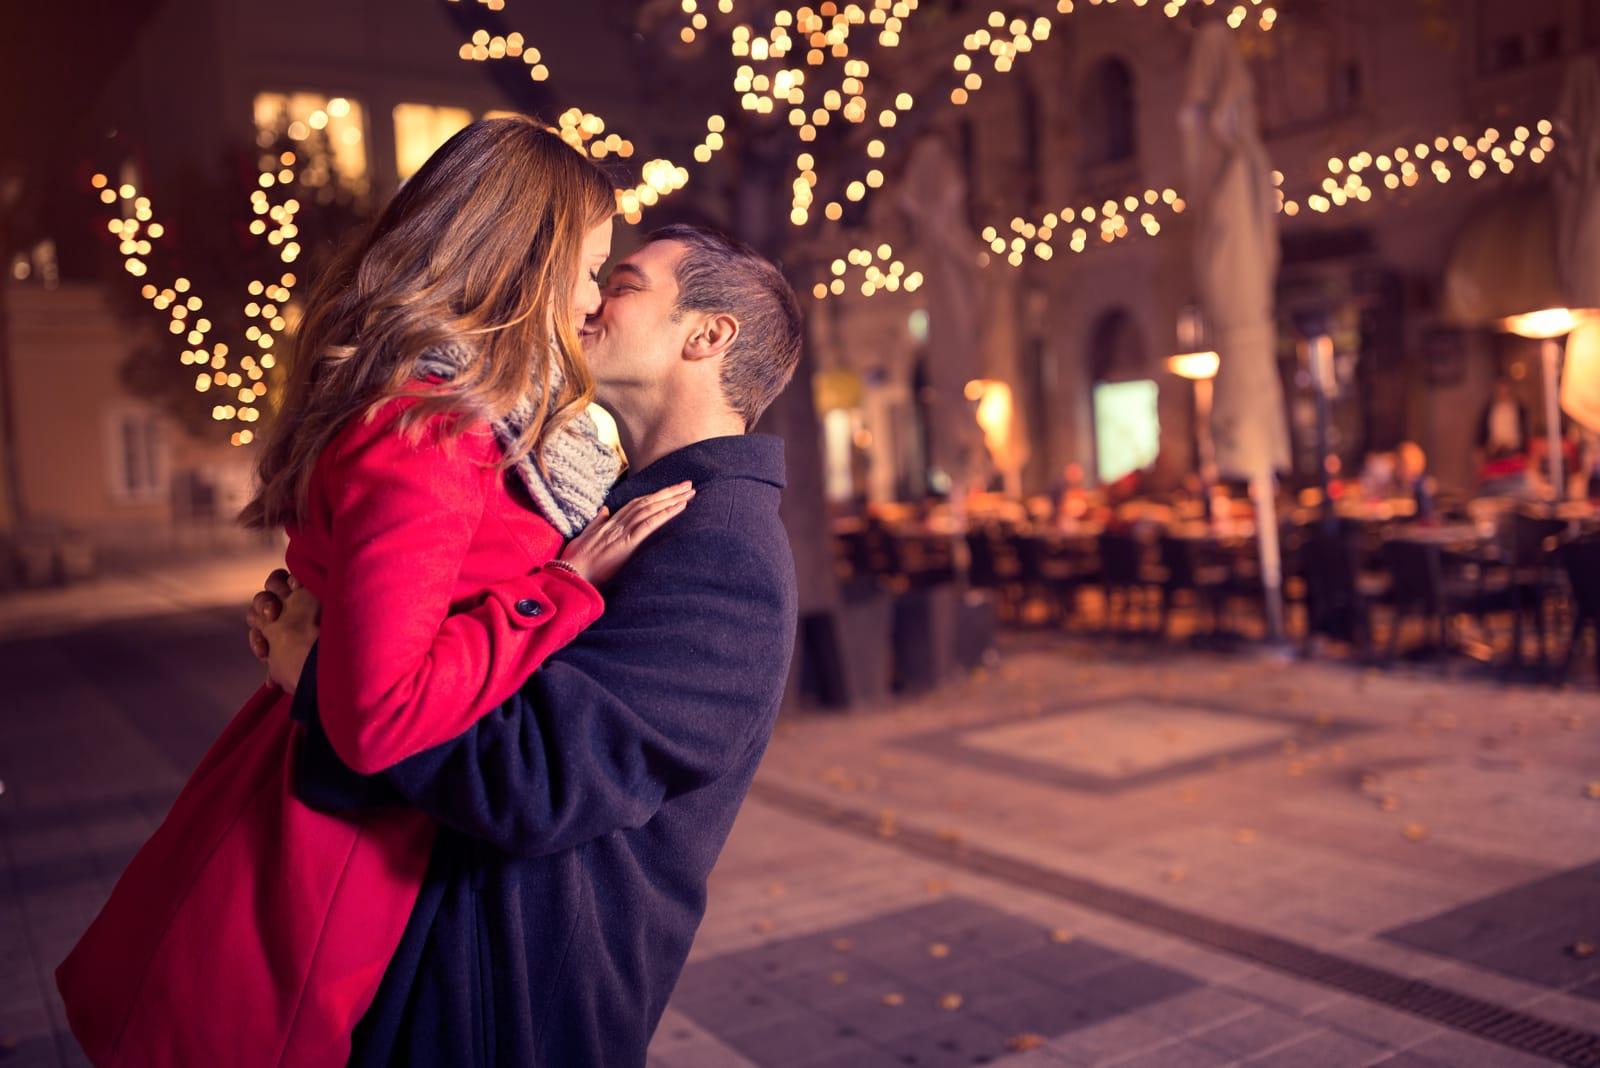 couple kissing tenderly